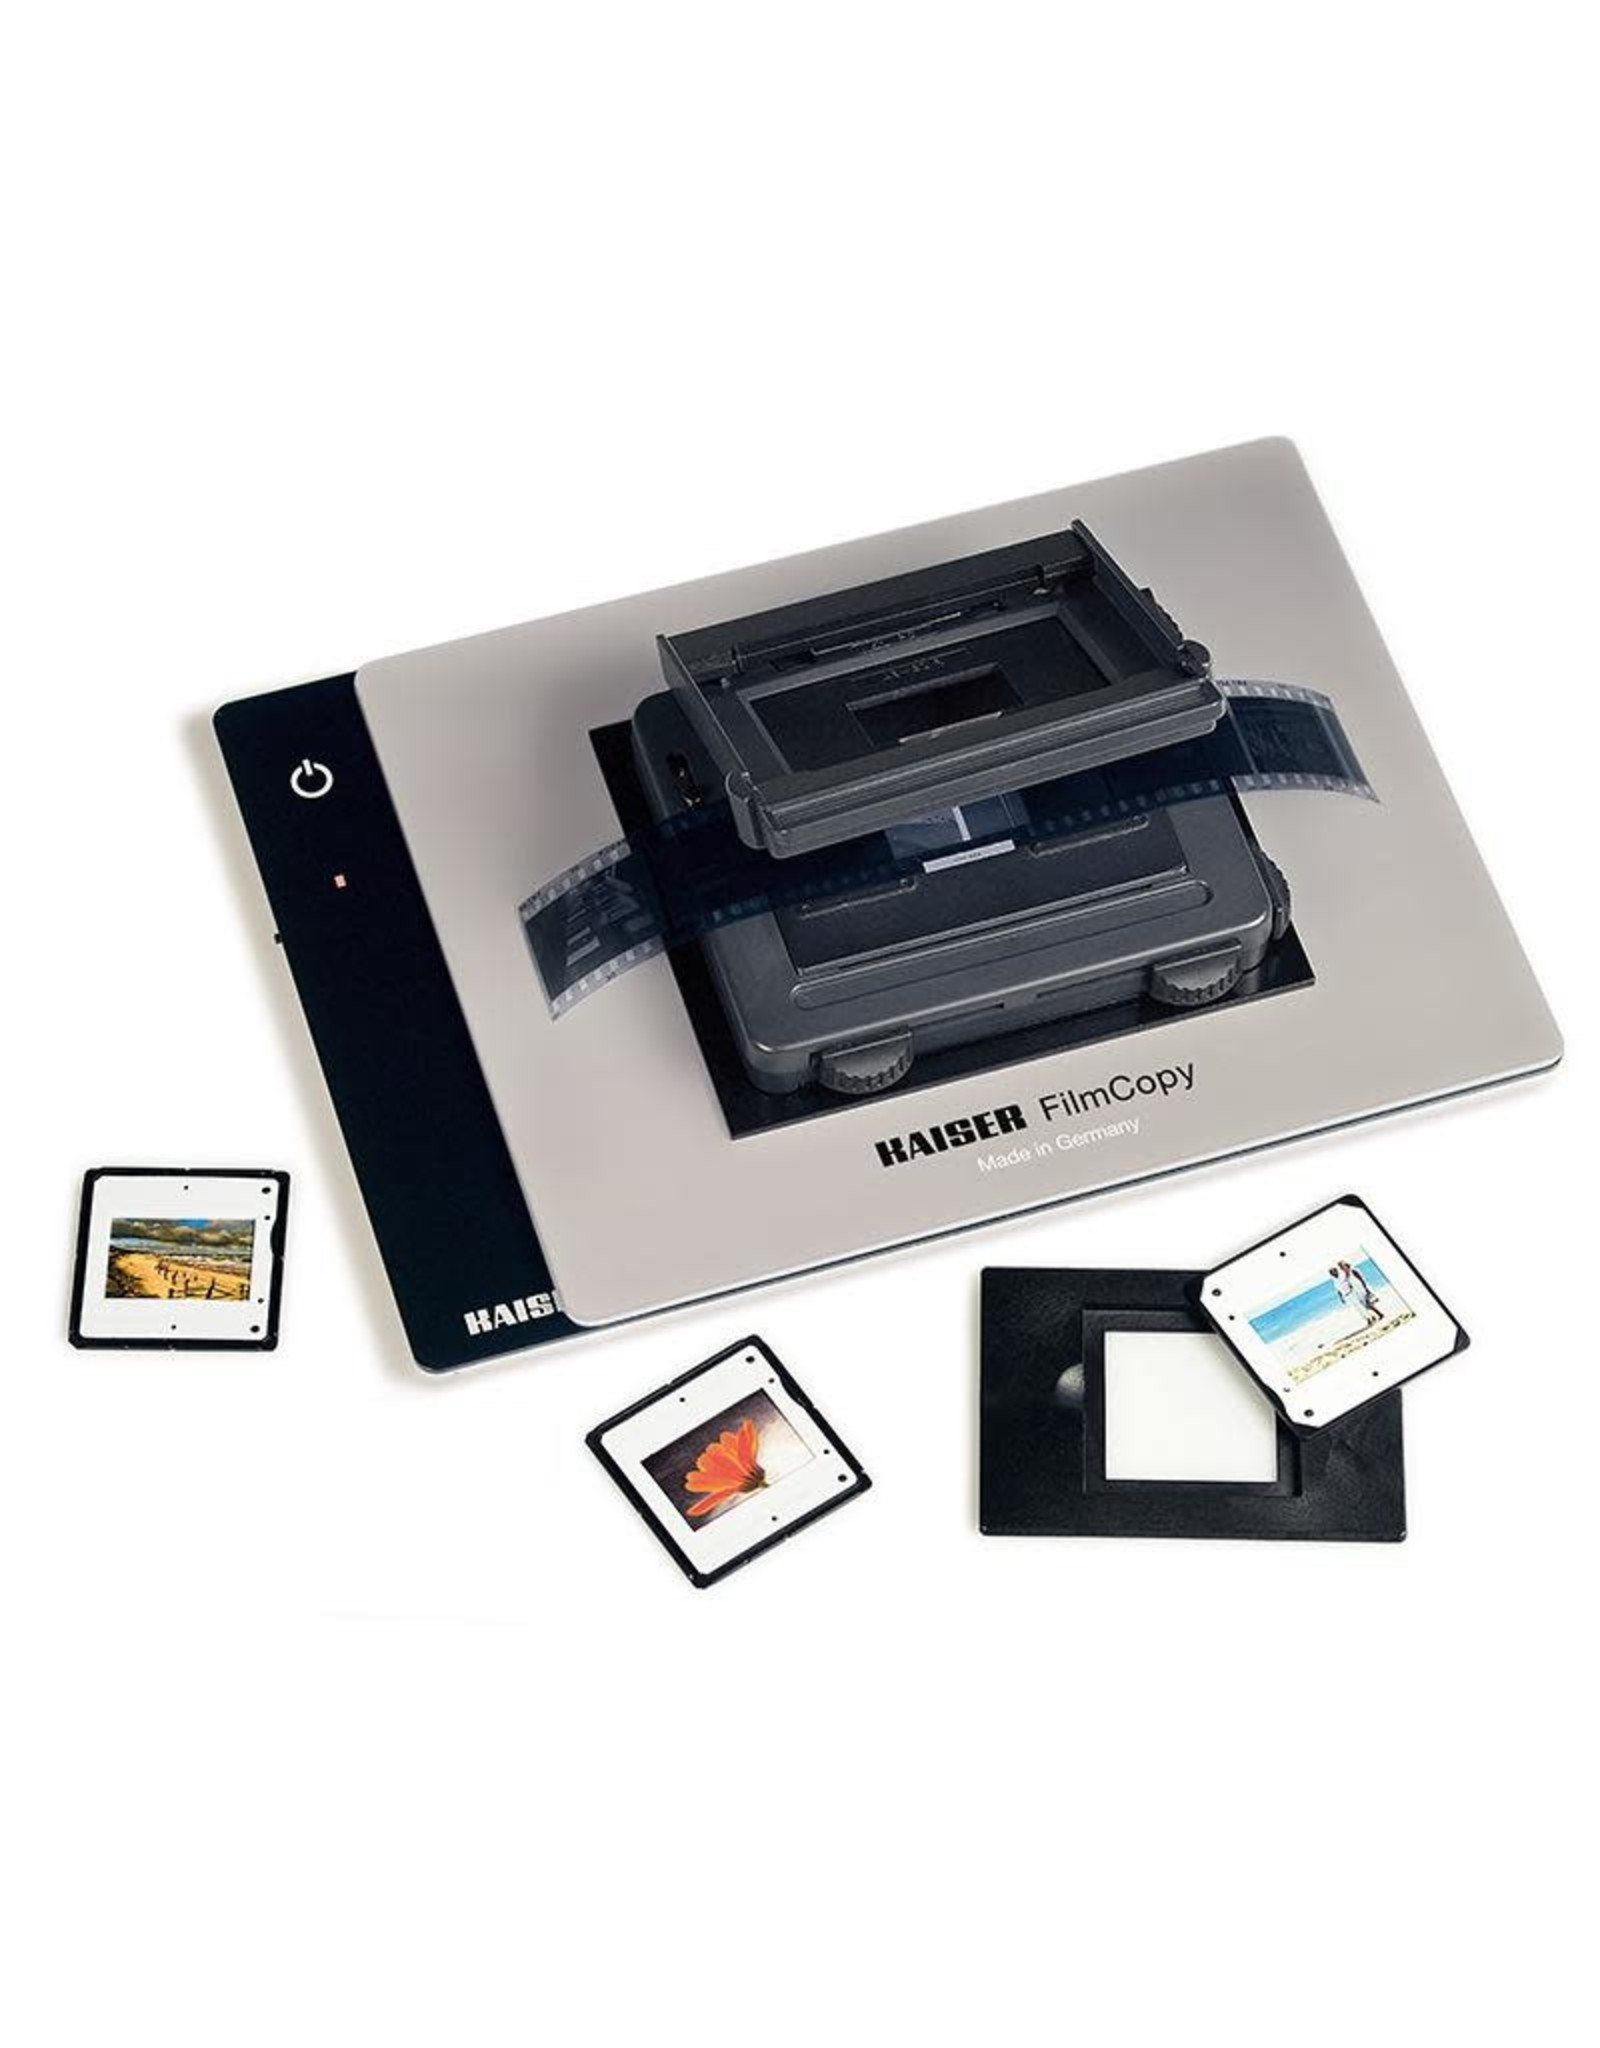 Kaiser Kaiser FilmCopy Vario Kit, consisting of FilmCopy Vario (2457) and slimlite plano LED Light Box 110 V, US-Plug (2453)